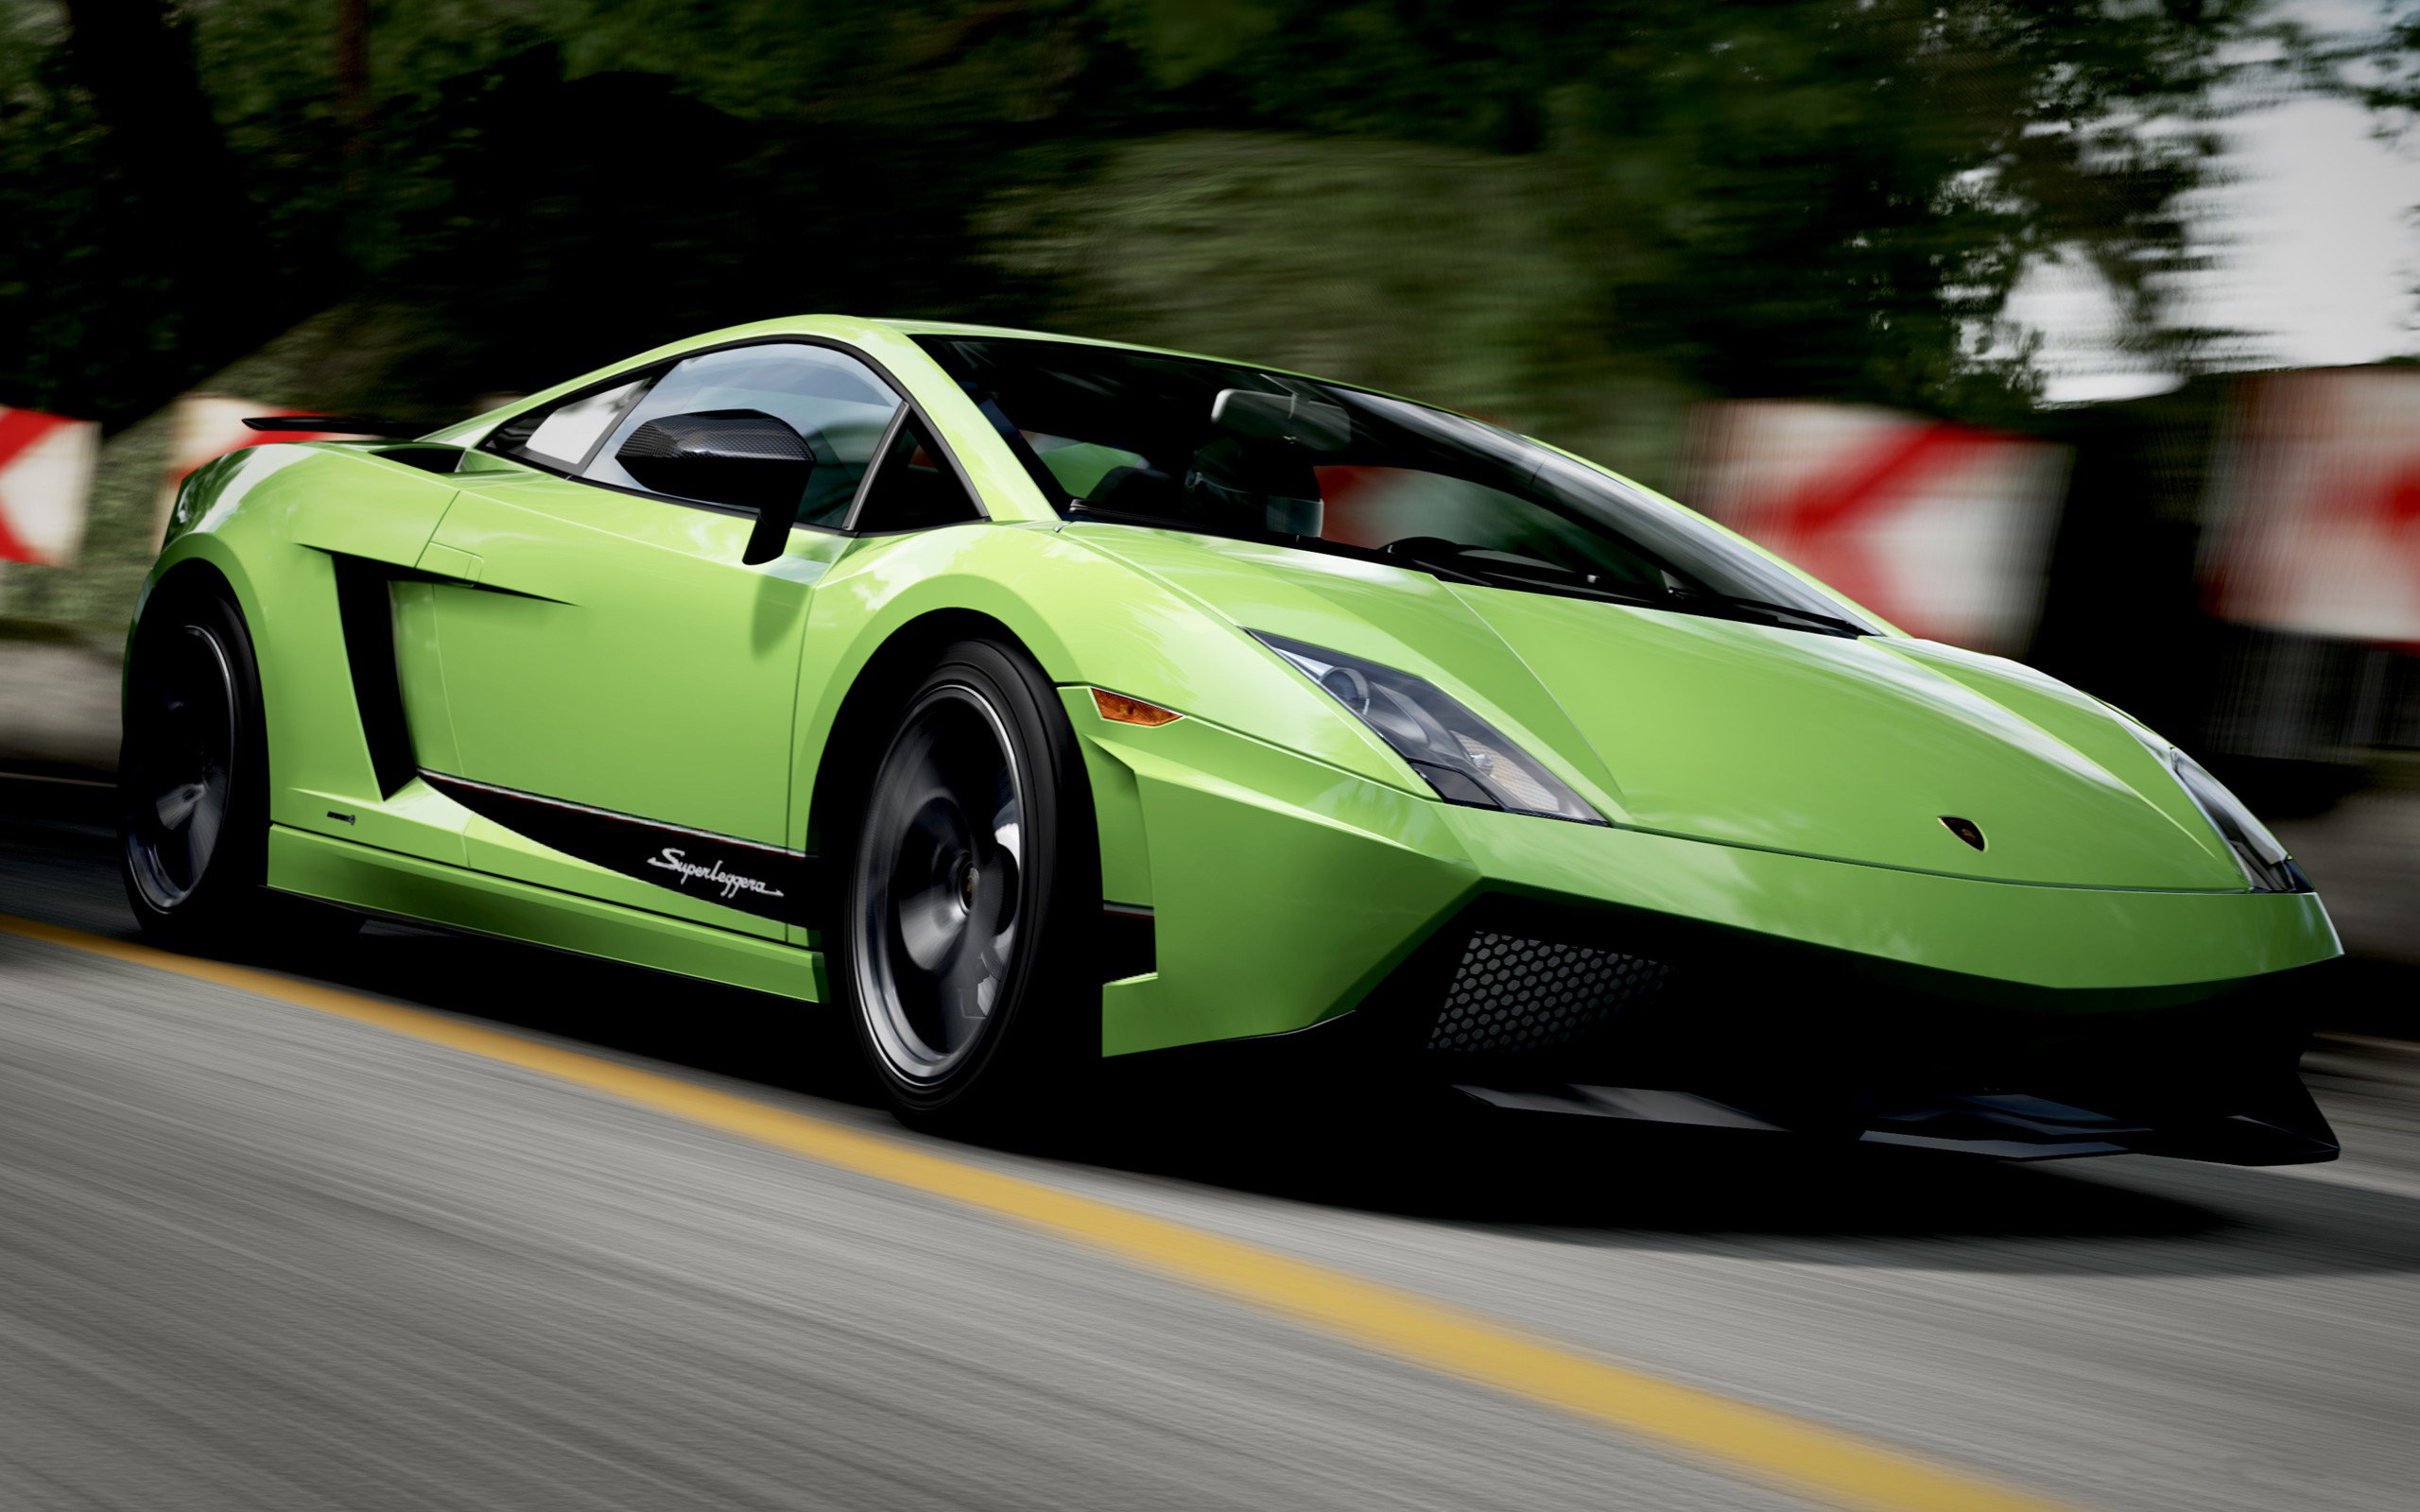 Dark Green Lamborghini Gallardo Green Lamborghini Gallardo